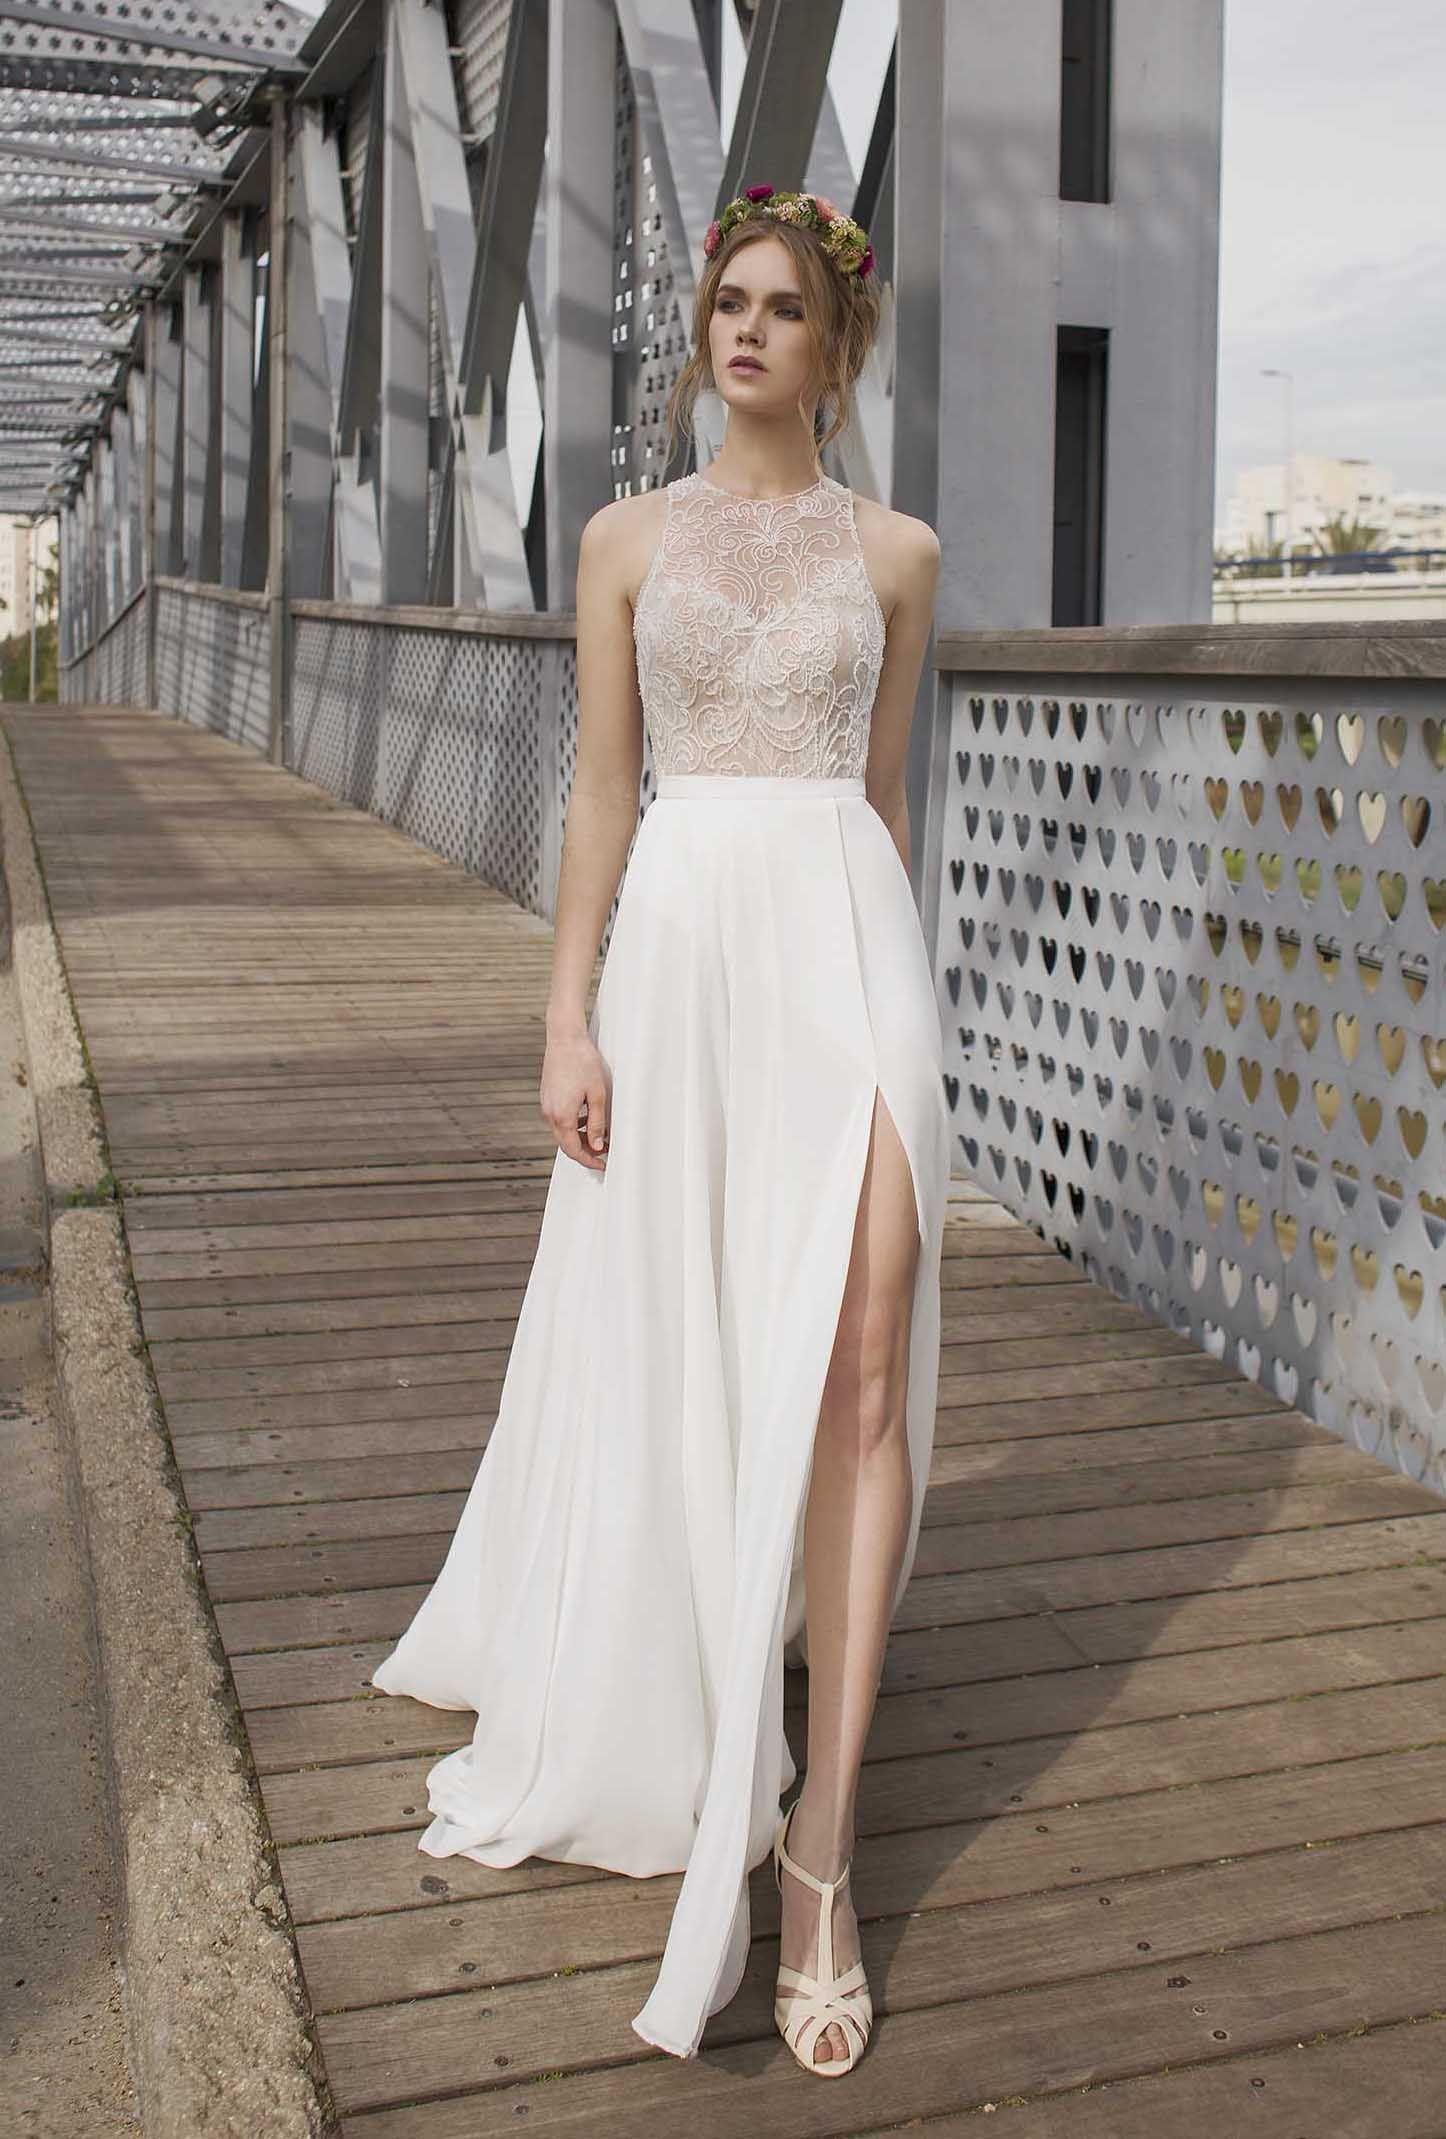 Limor rosen ucurban dreamsud halter neck lace wedding dresses and